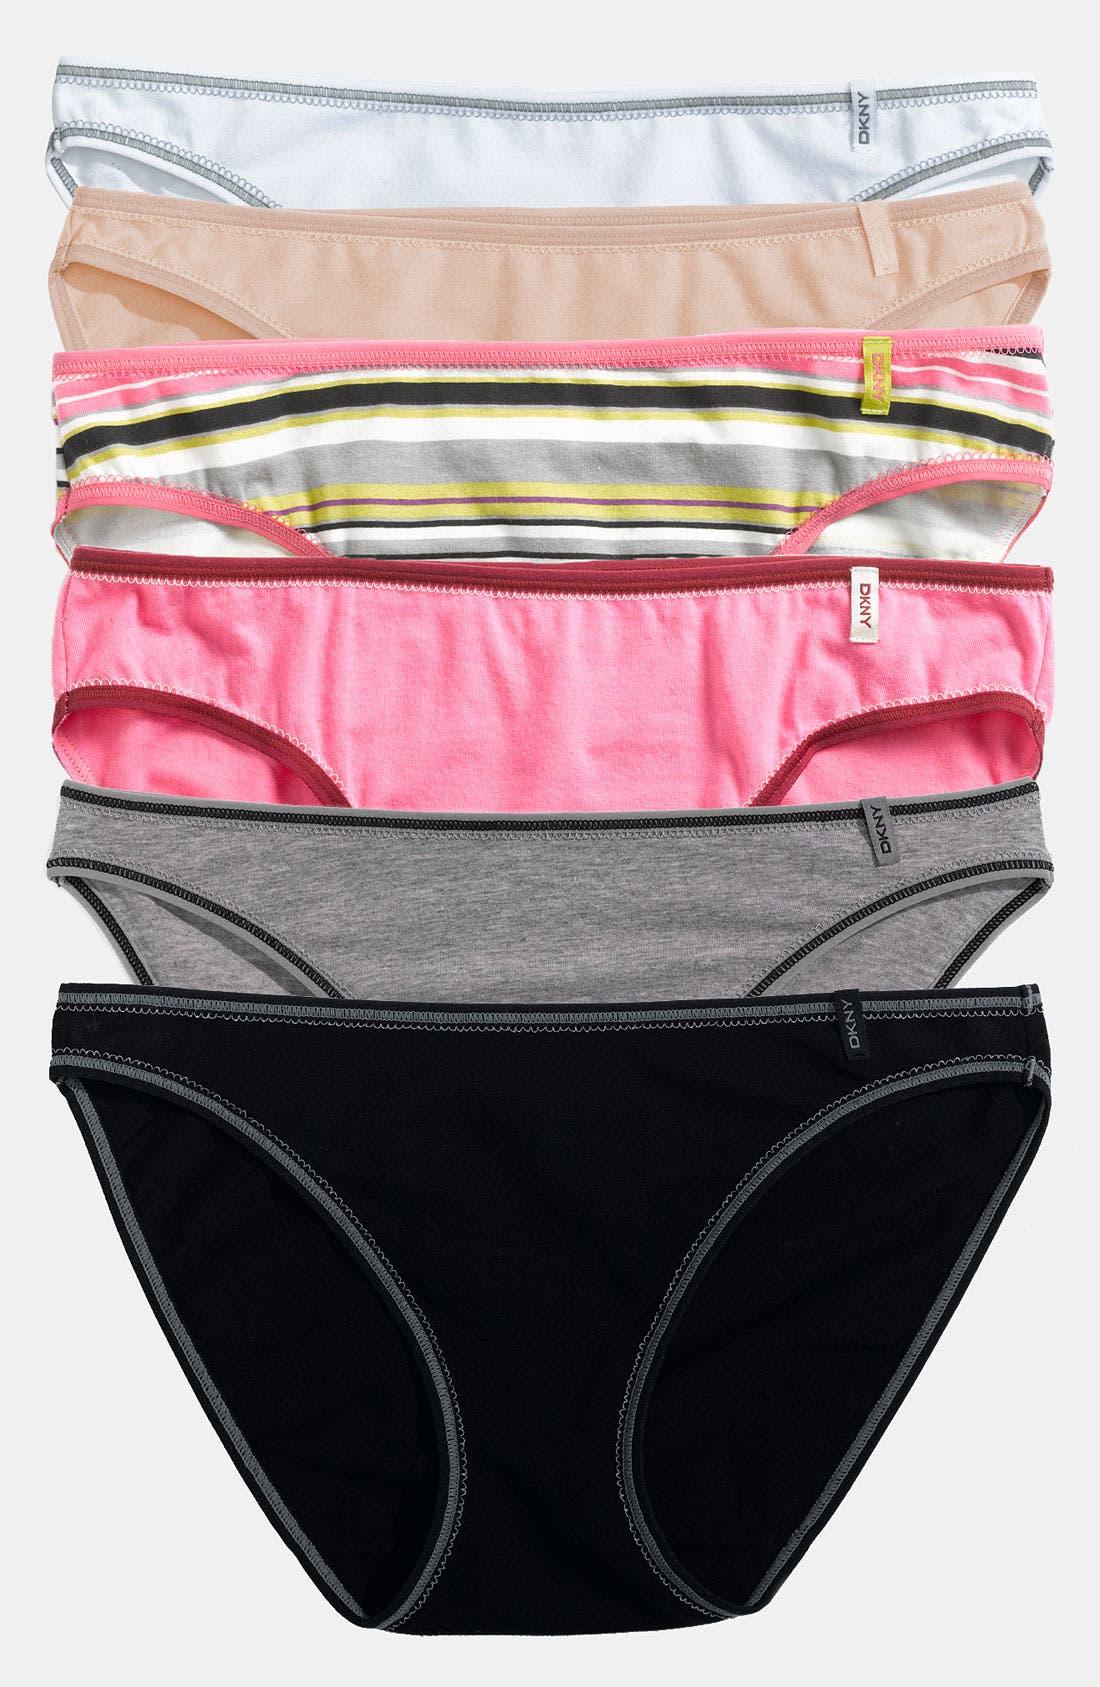 Main Image - DKNY 'Comfort Classic' Bikini (3 for $27)